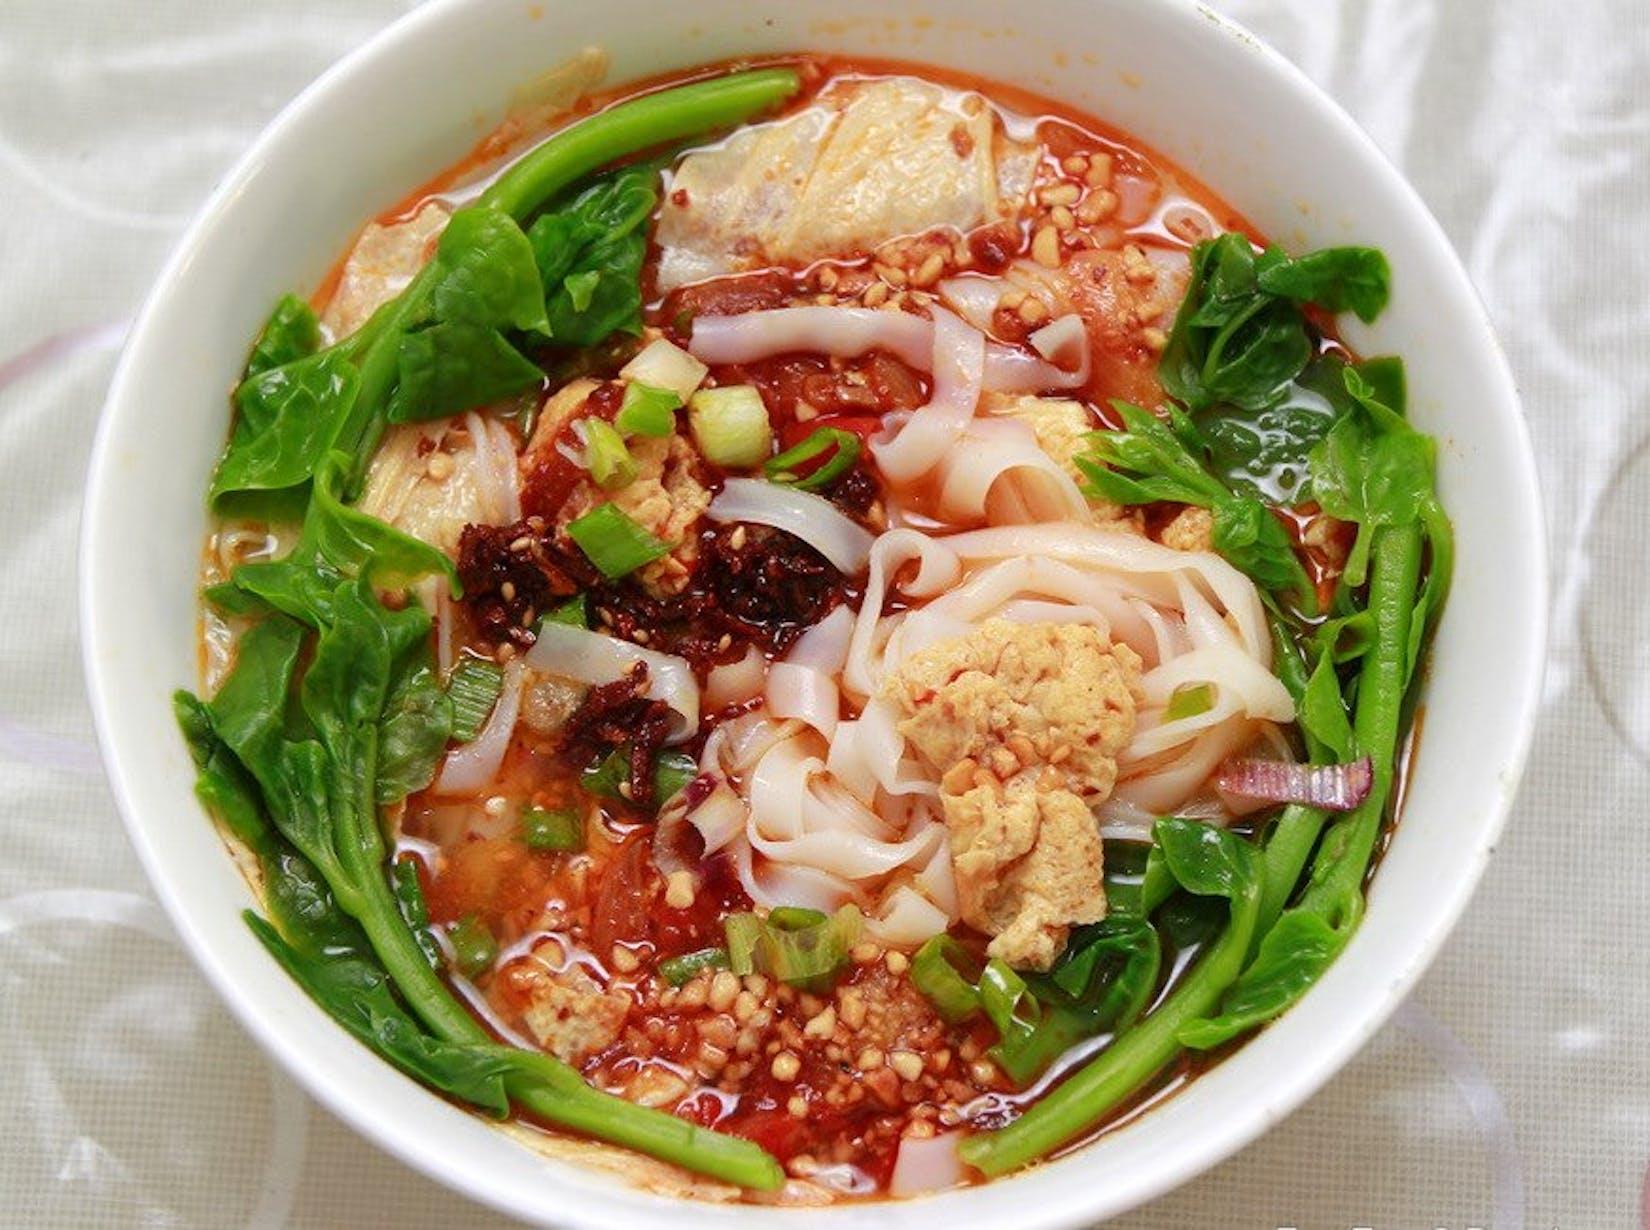 Taung Paw Thar noodle shop   yathar